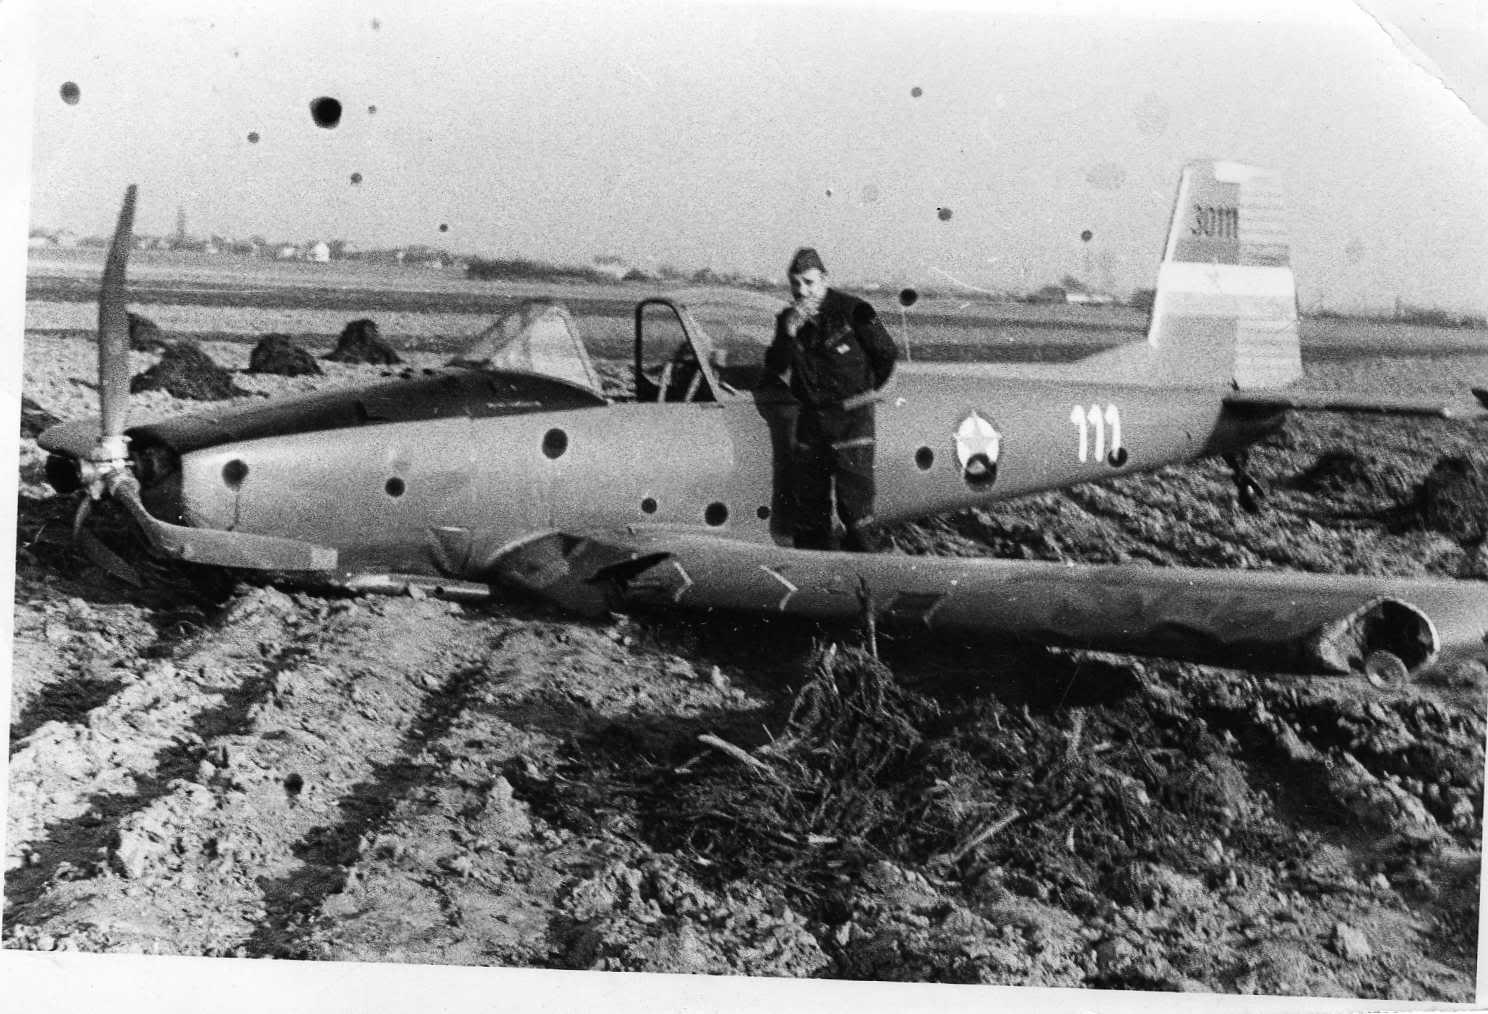 J-20 KRAGUJ Img007-1